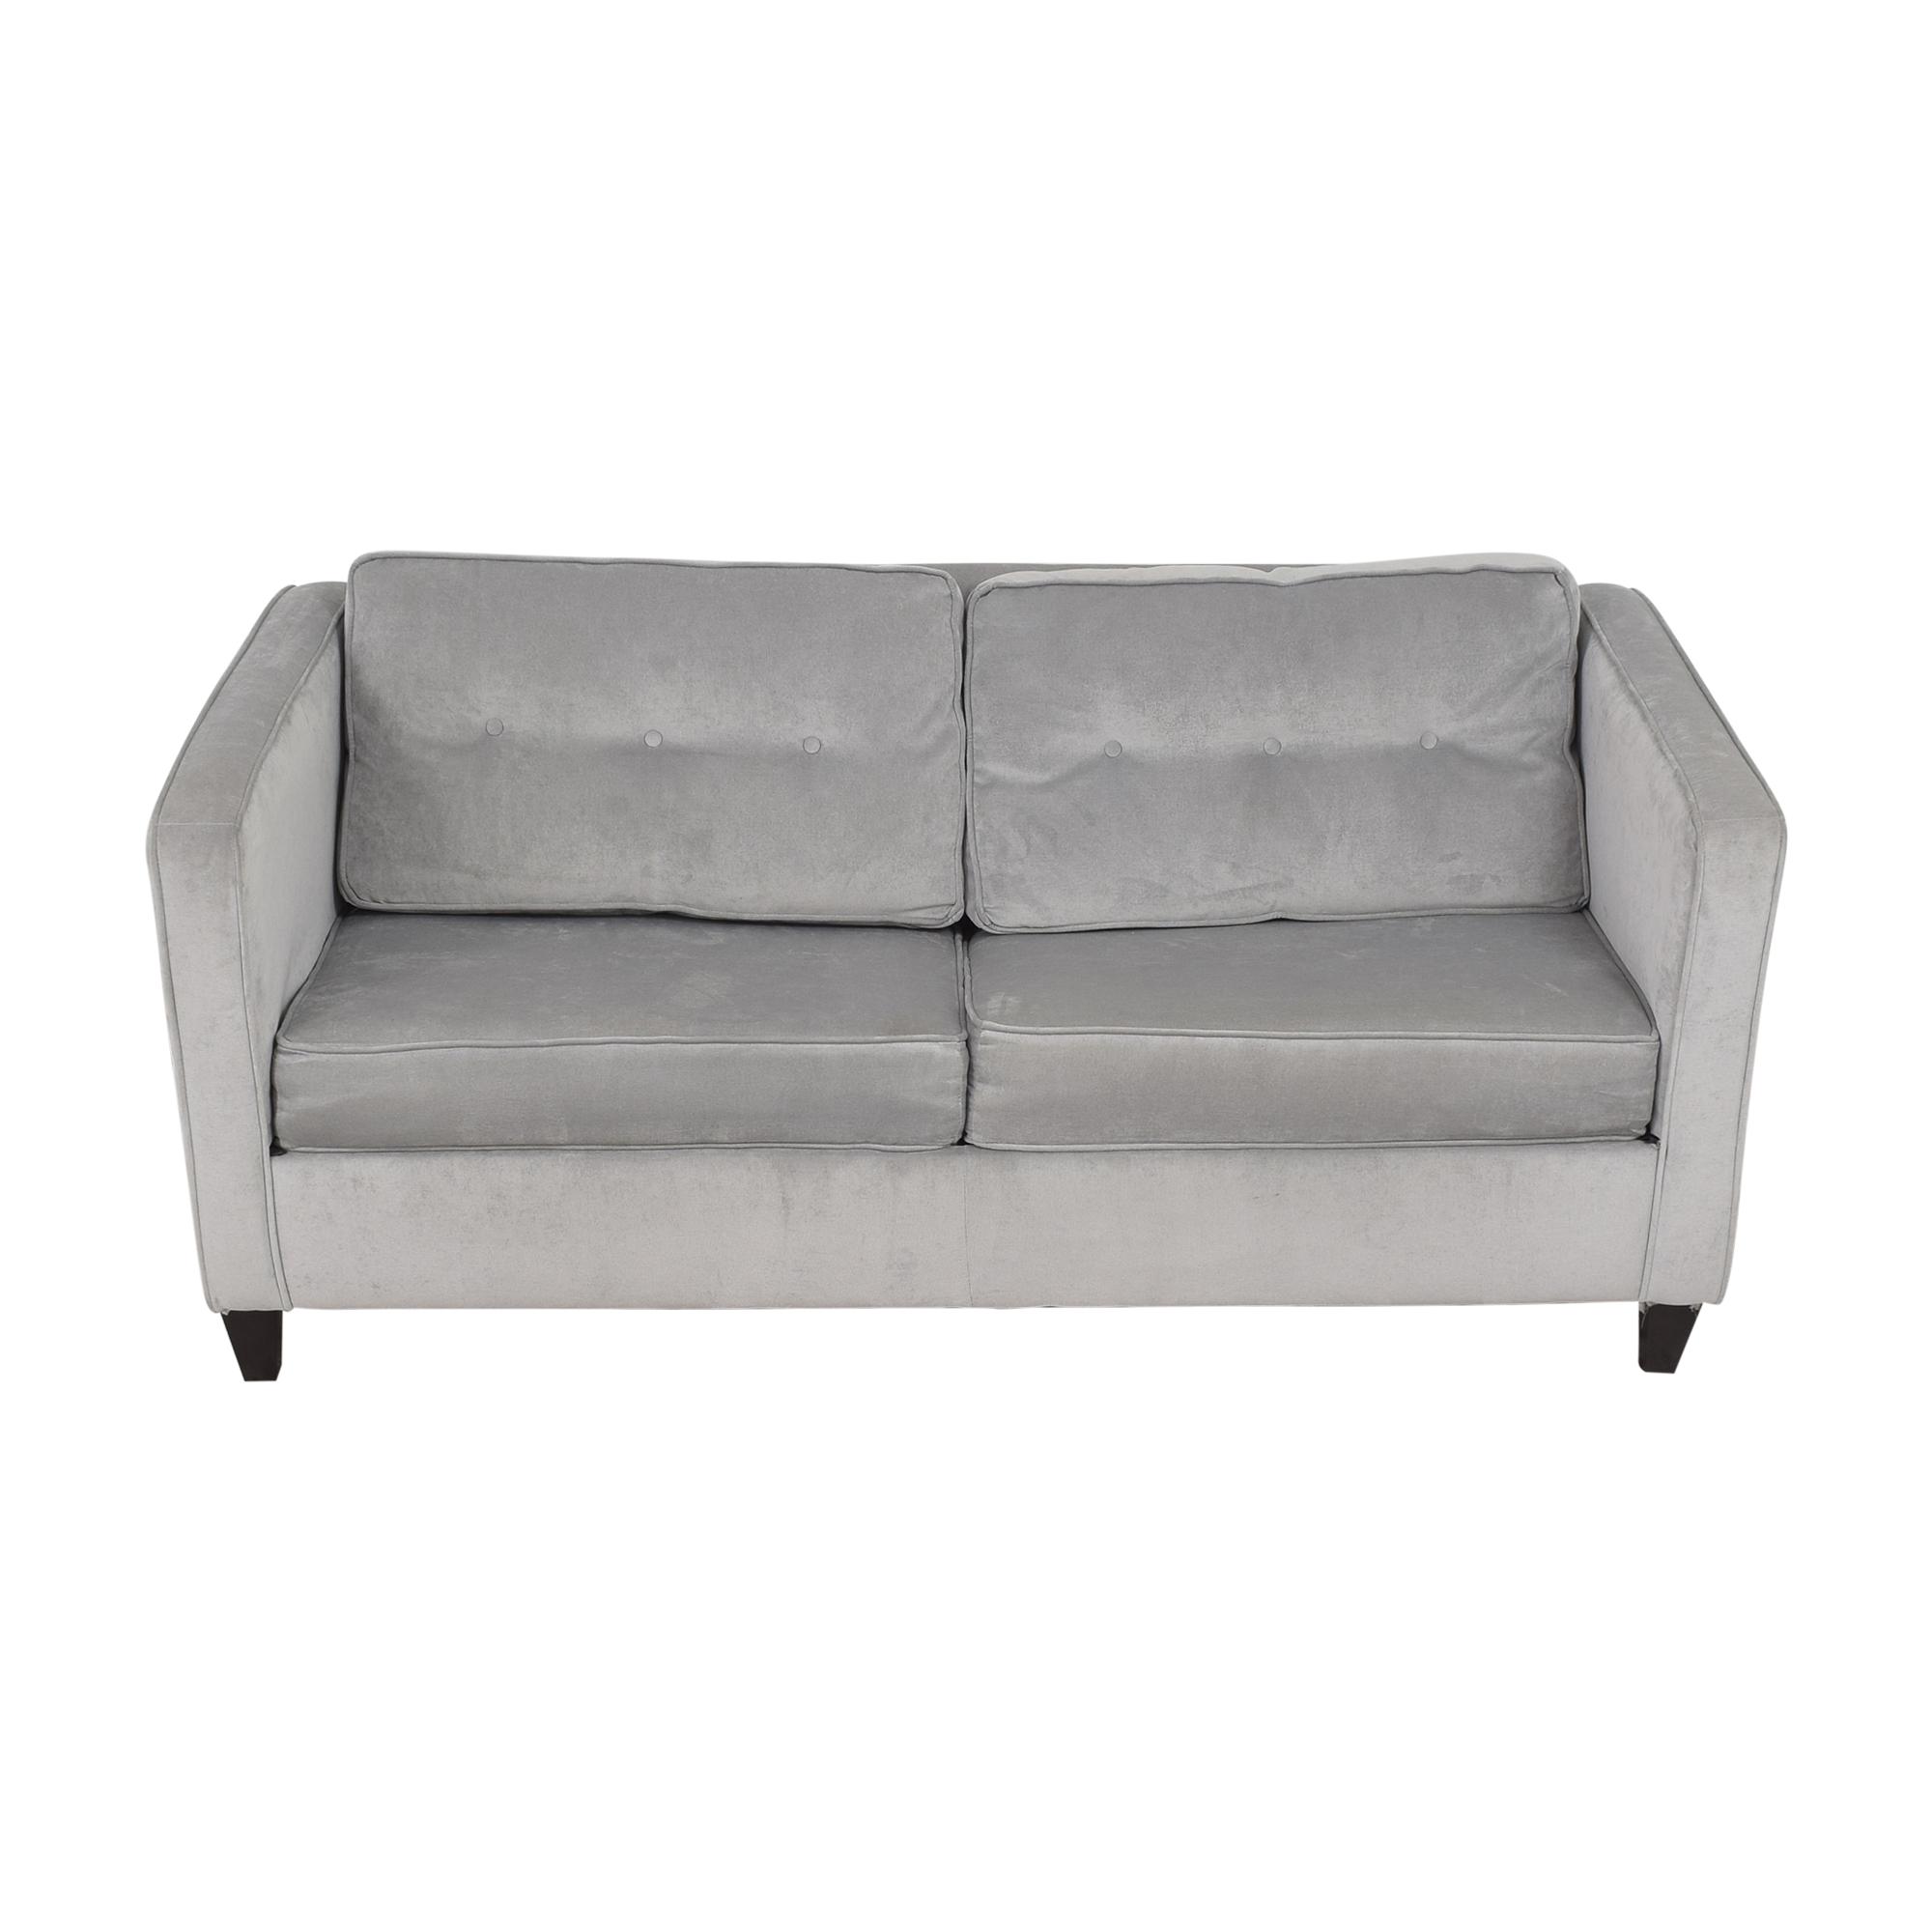 Wayfair Wayfair Ebern Designs Dengler Square Arm Sleeper Sofa for sale